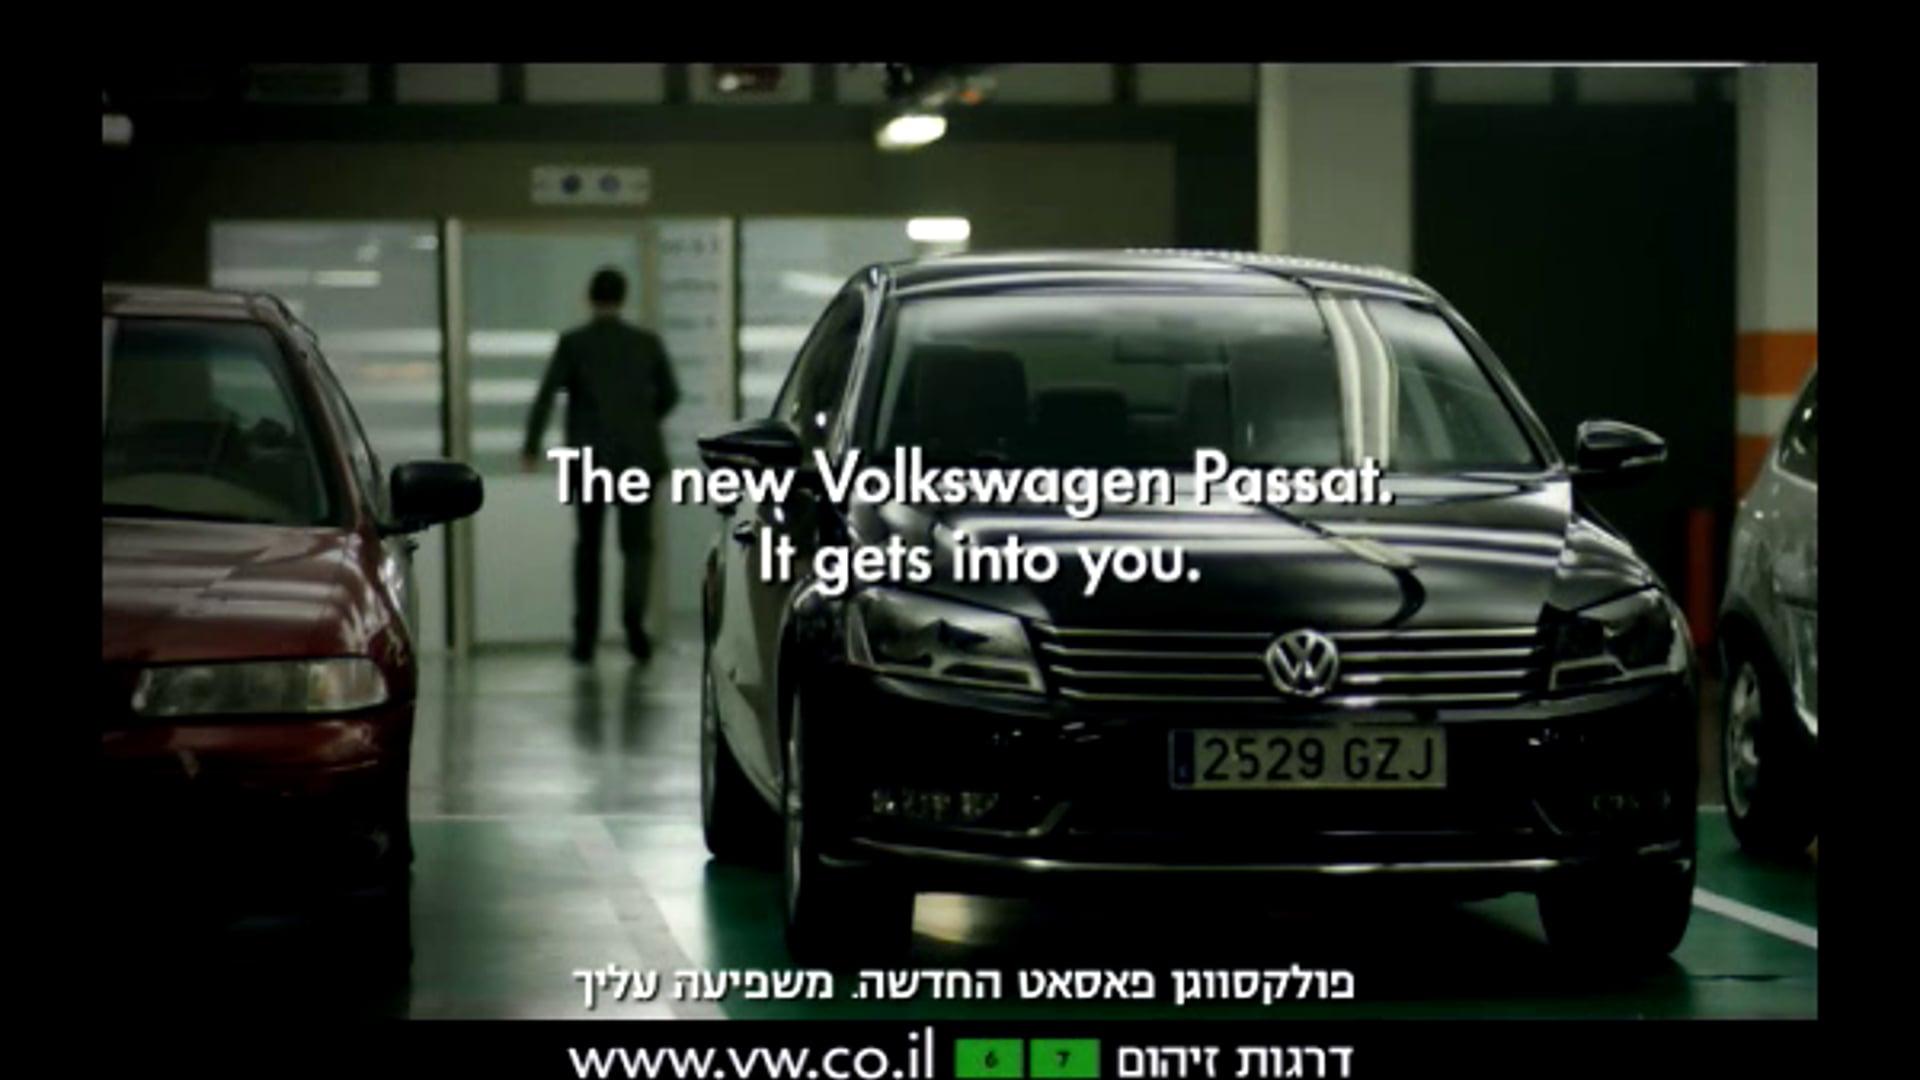 FIAT PASSAT - ISRAEL